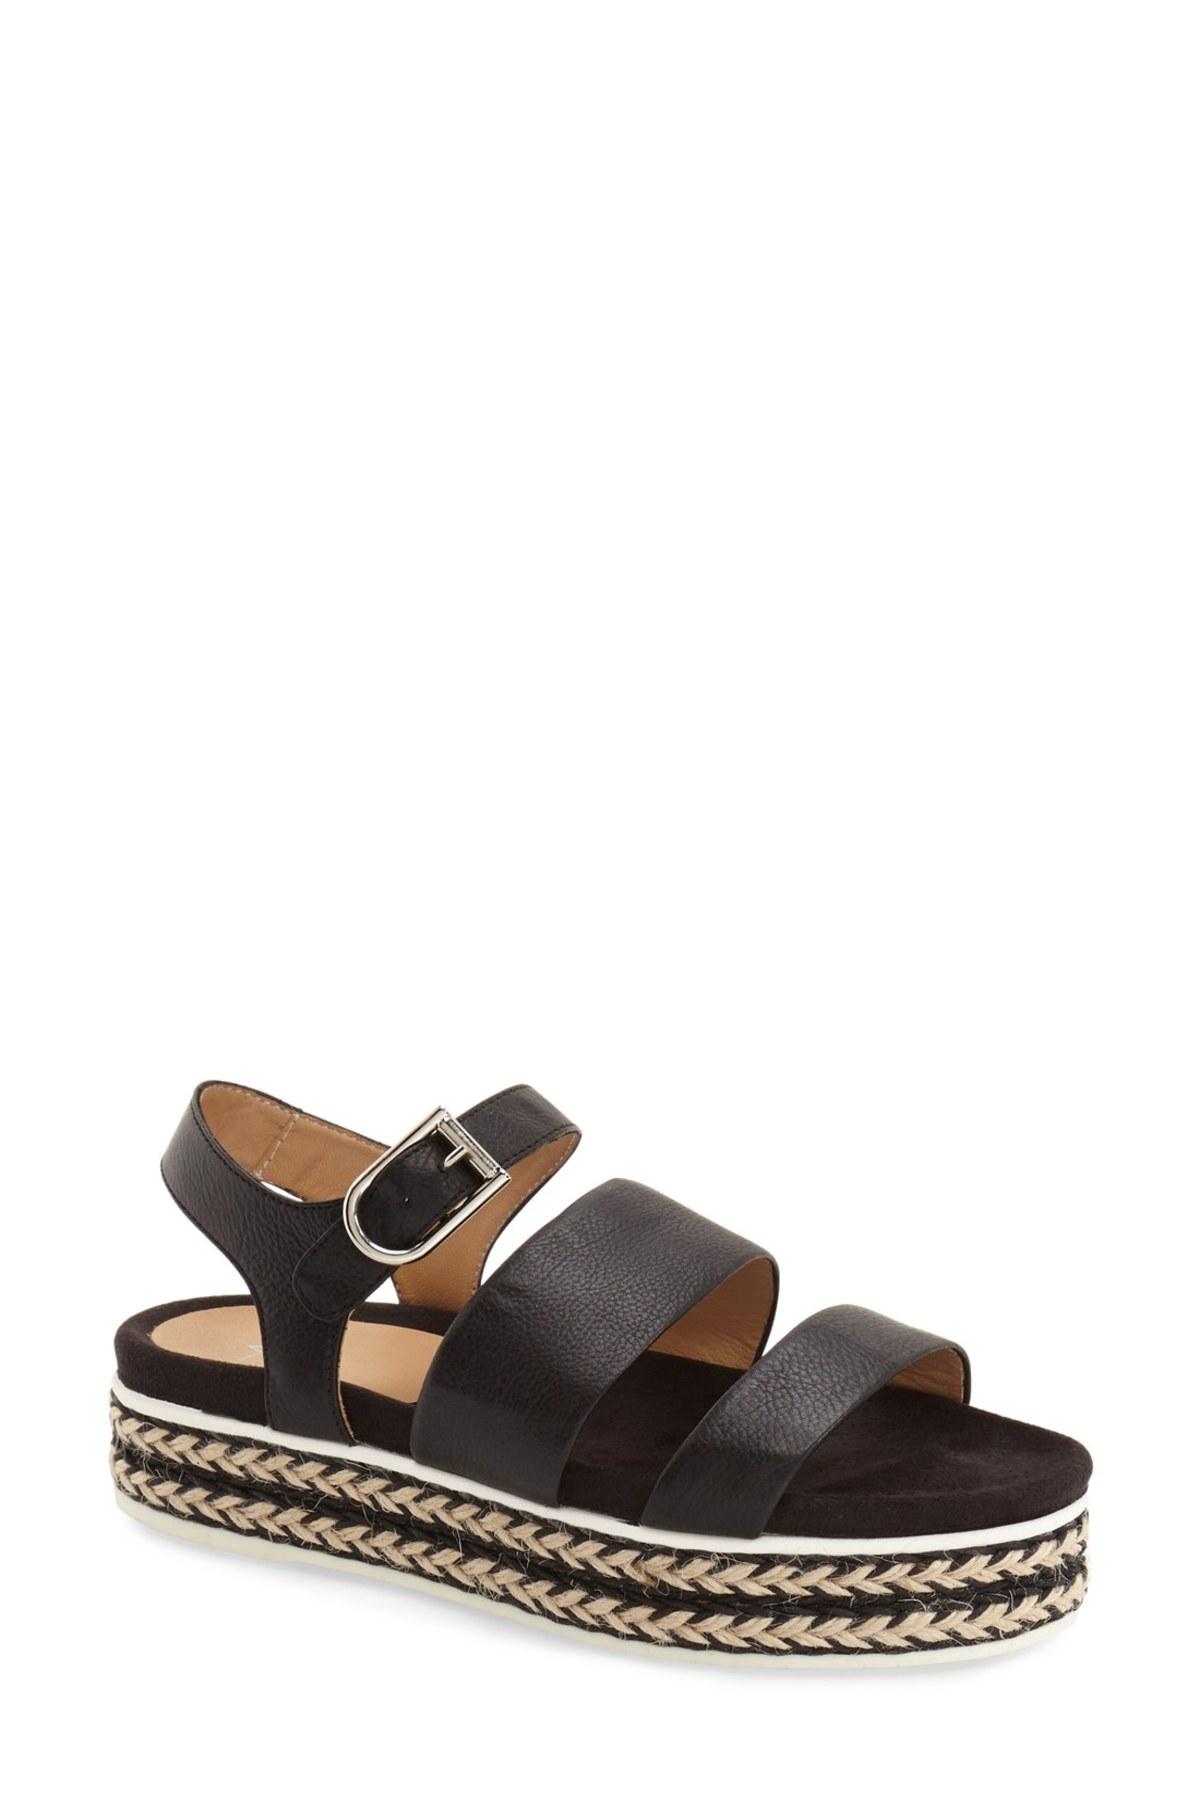 Aquatalia Celina Platform Sandal Women In Black Lyst